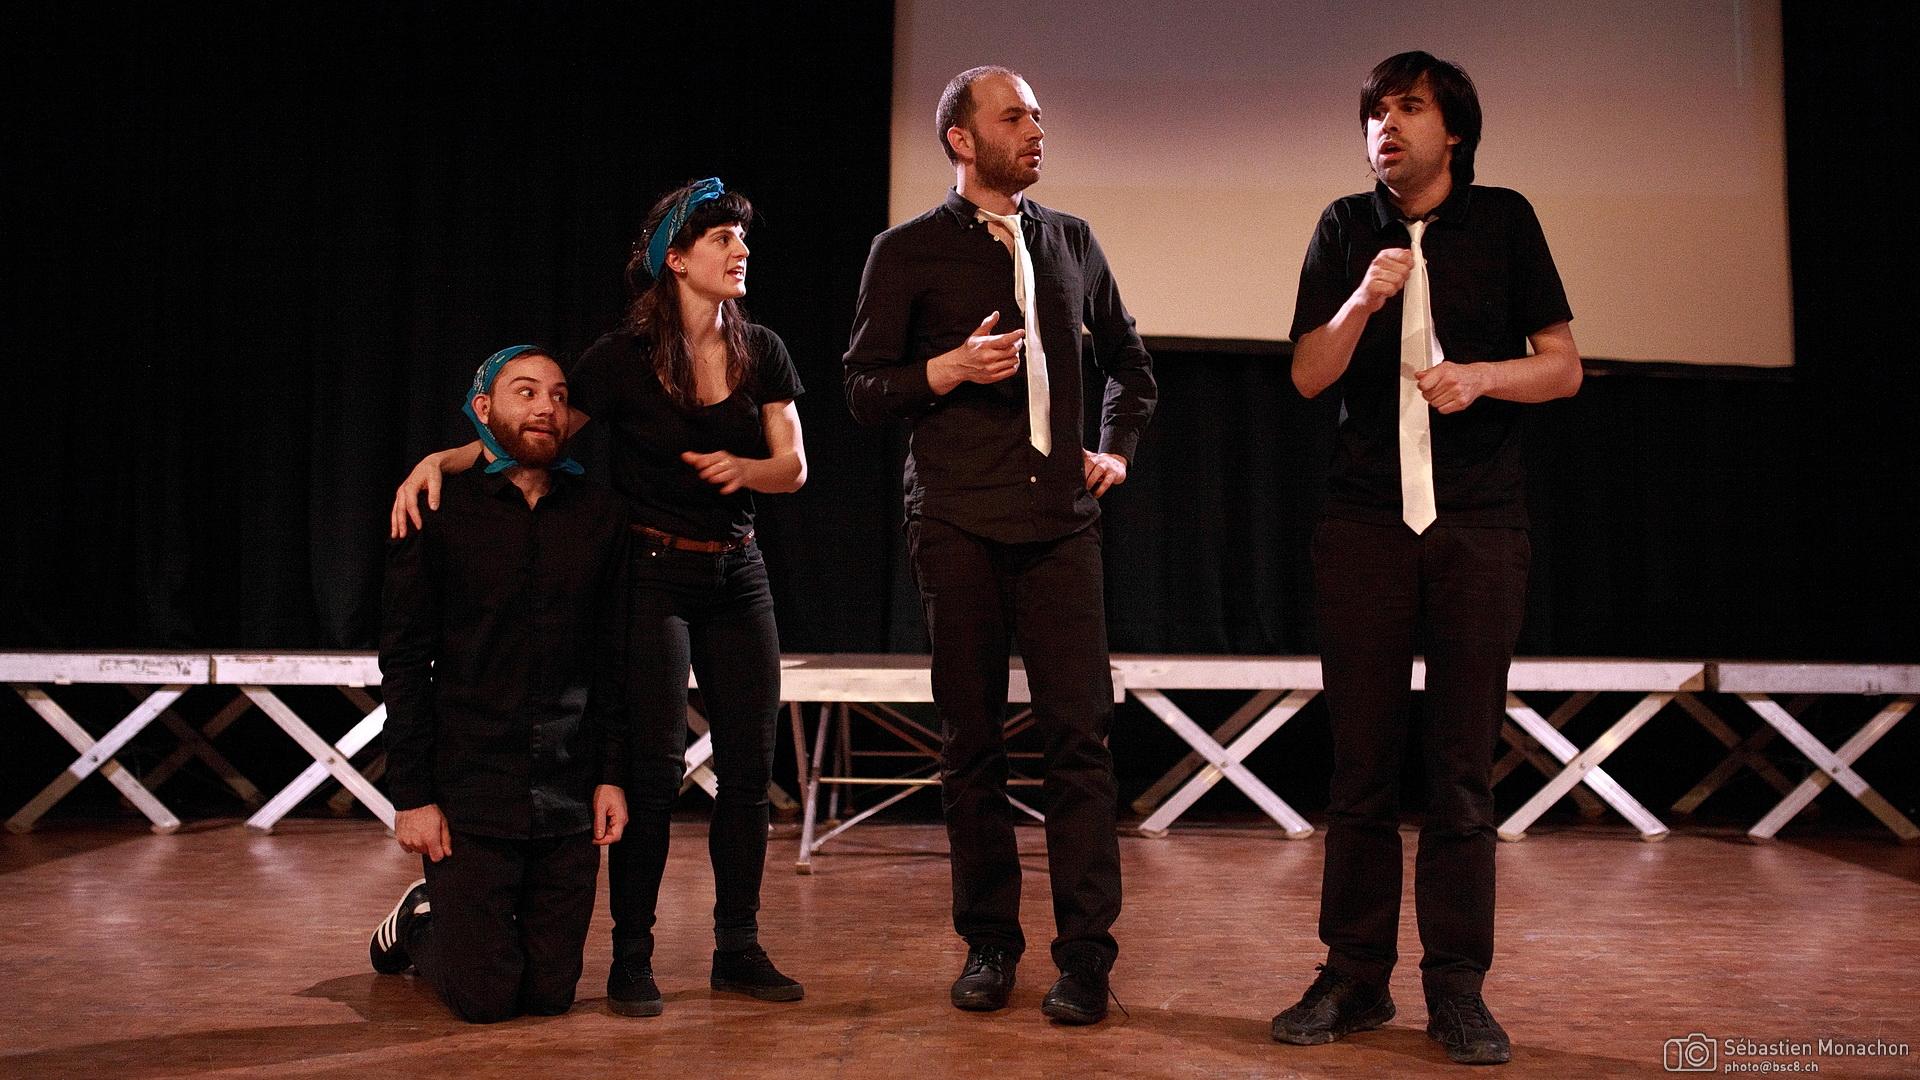 20_ans_du_PIP-3e_soir-EPFL-10_octobre_2015-c_SÇbastien_Monachon__79__IMG_9022.JPG